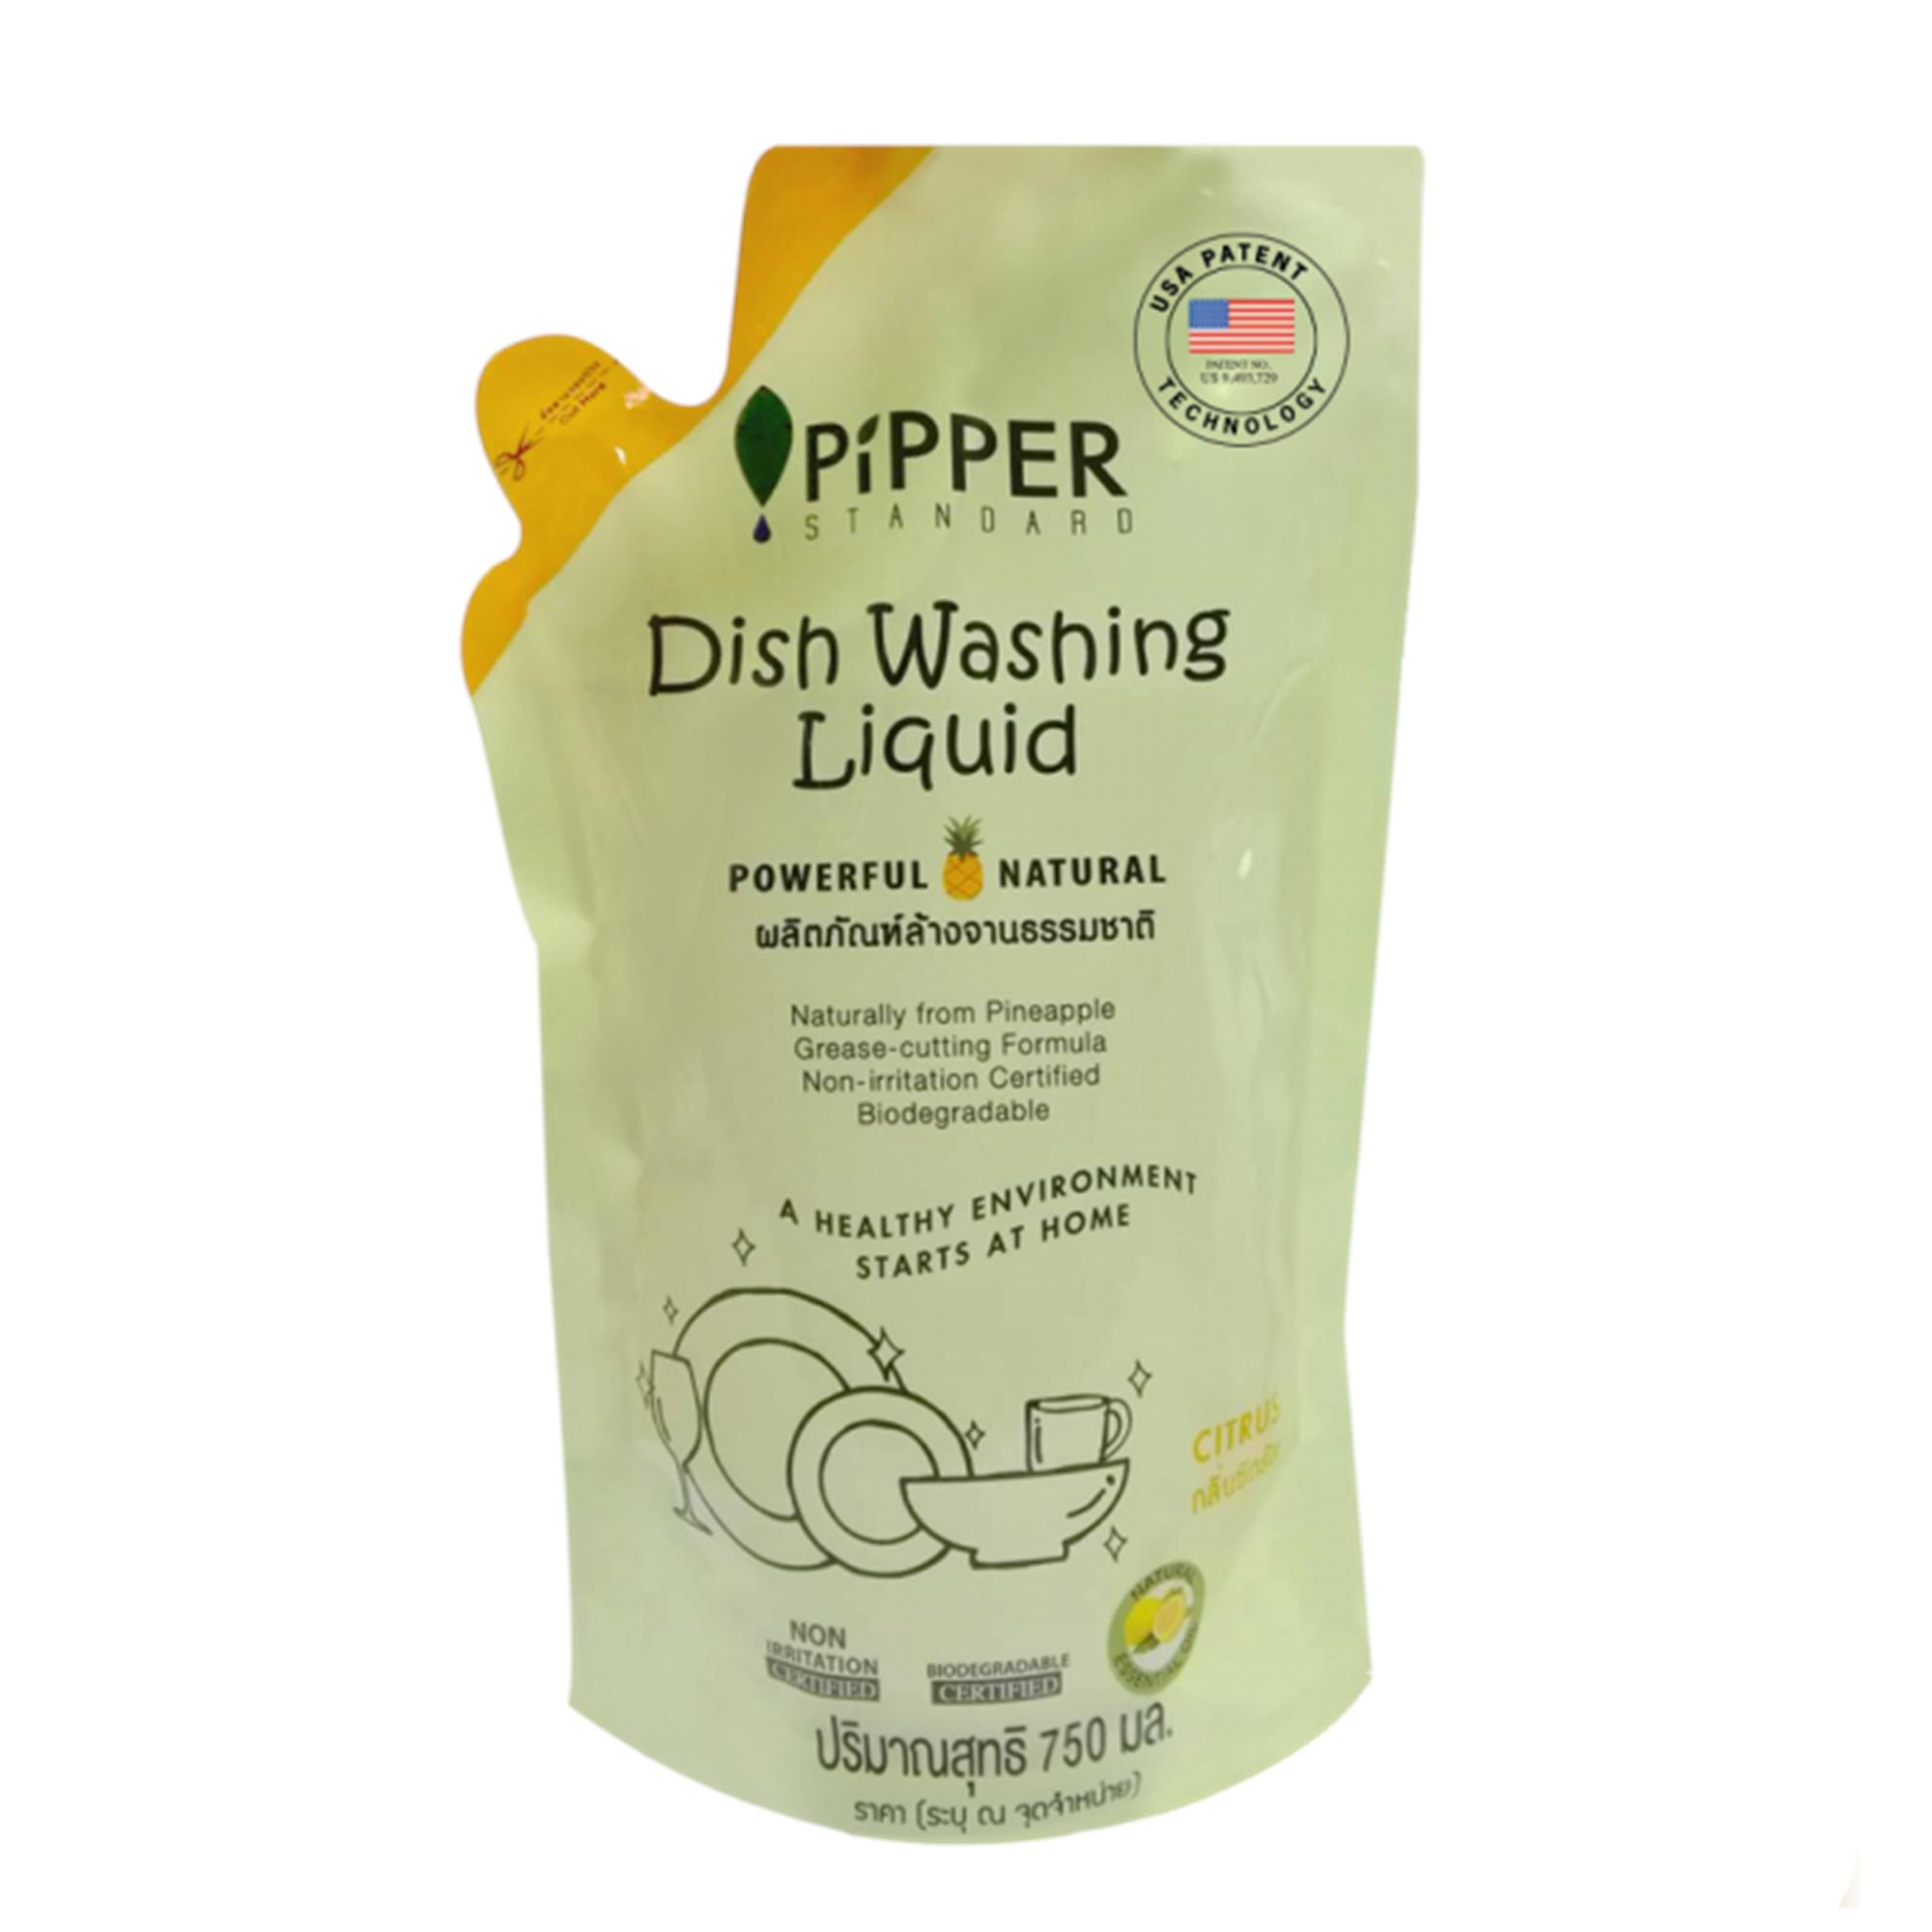 PIPPER STANDARD Dish Washing Liquid Citrus 750ml